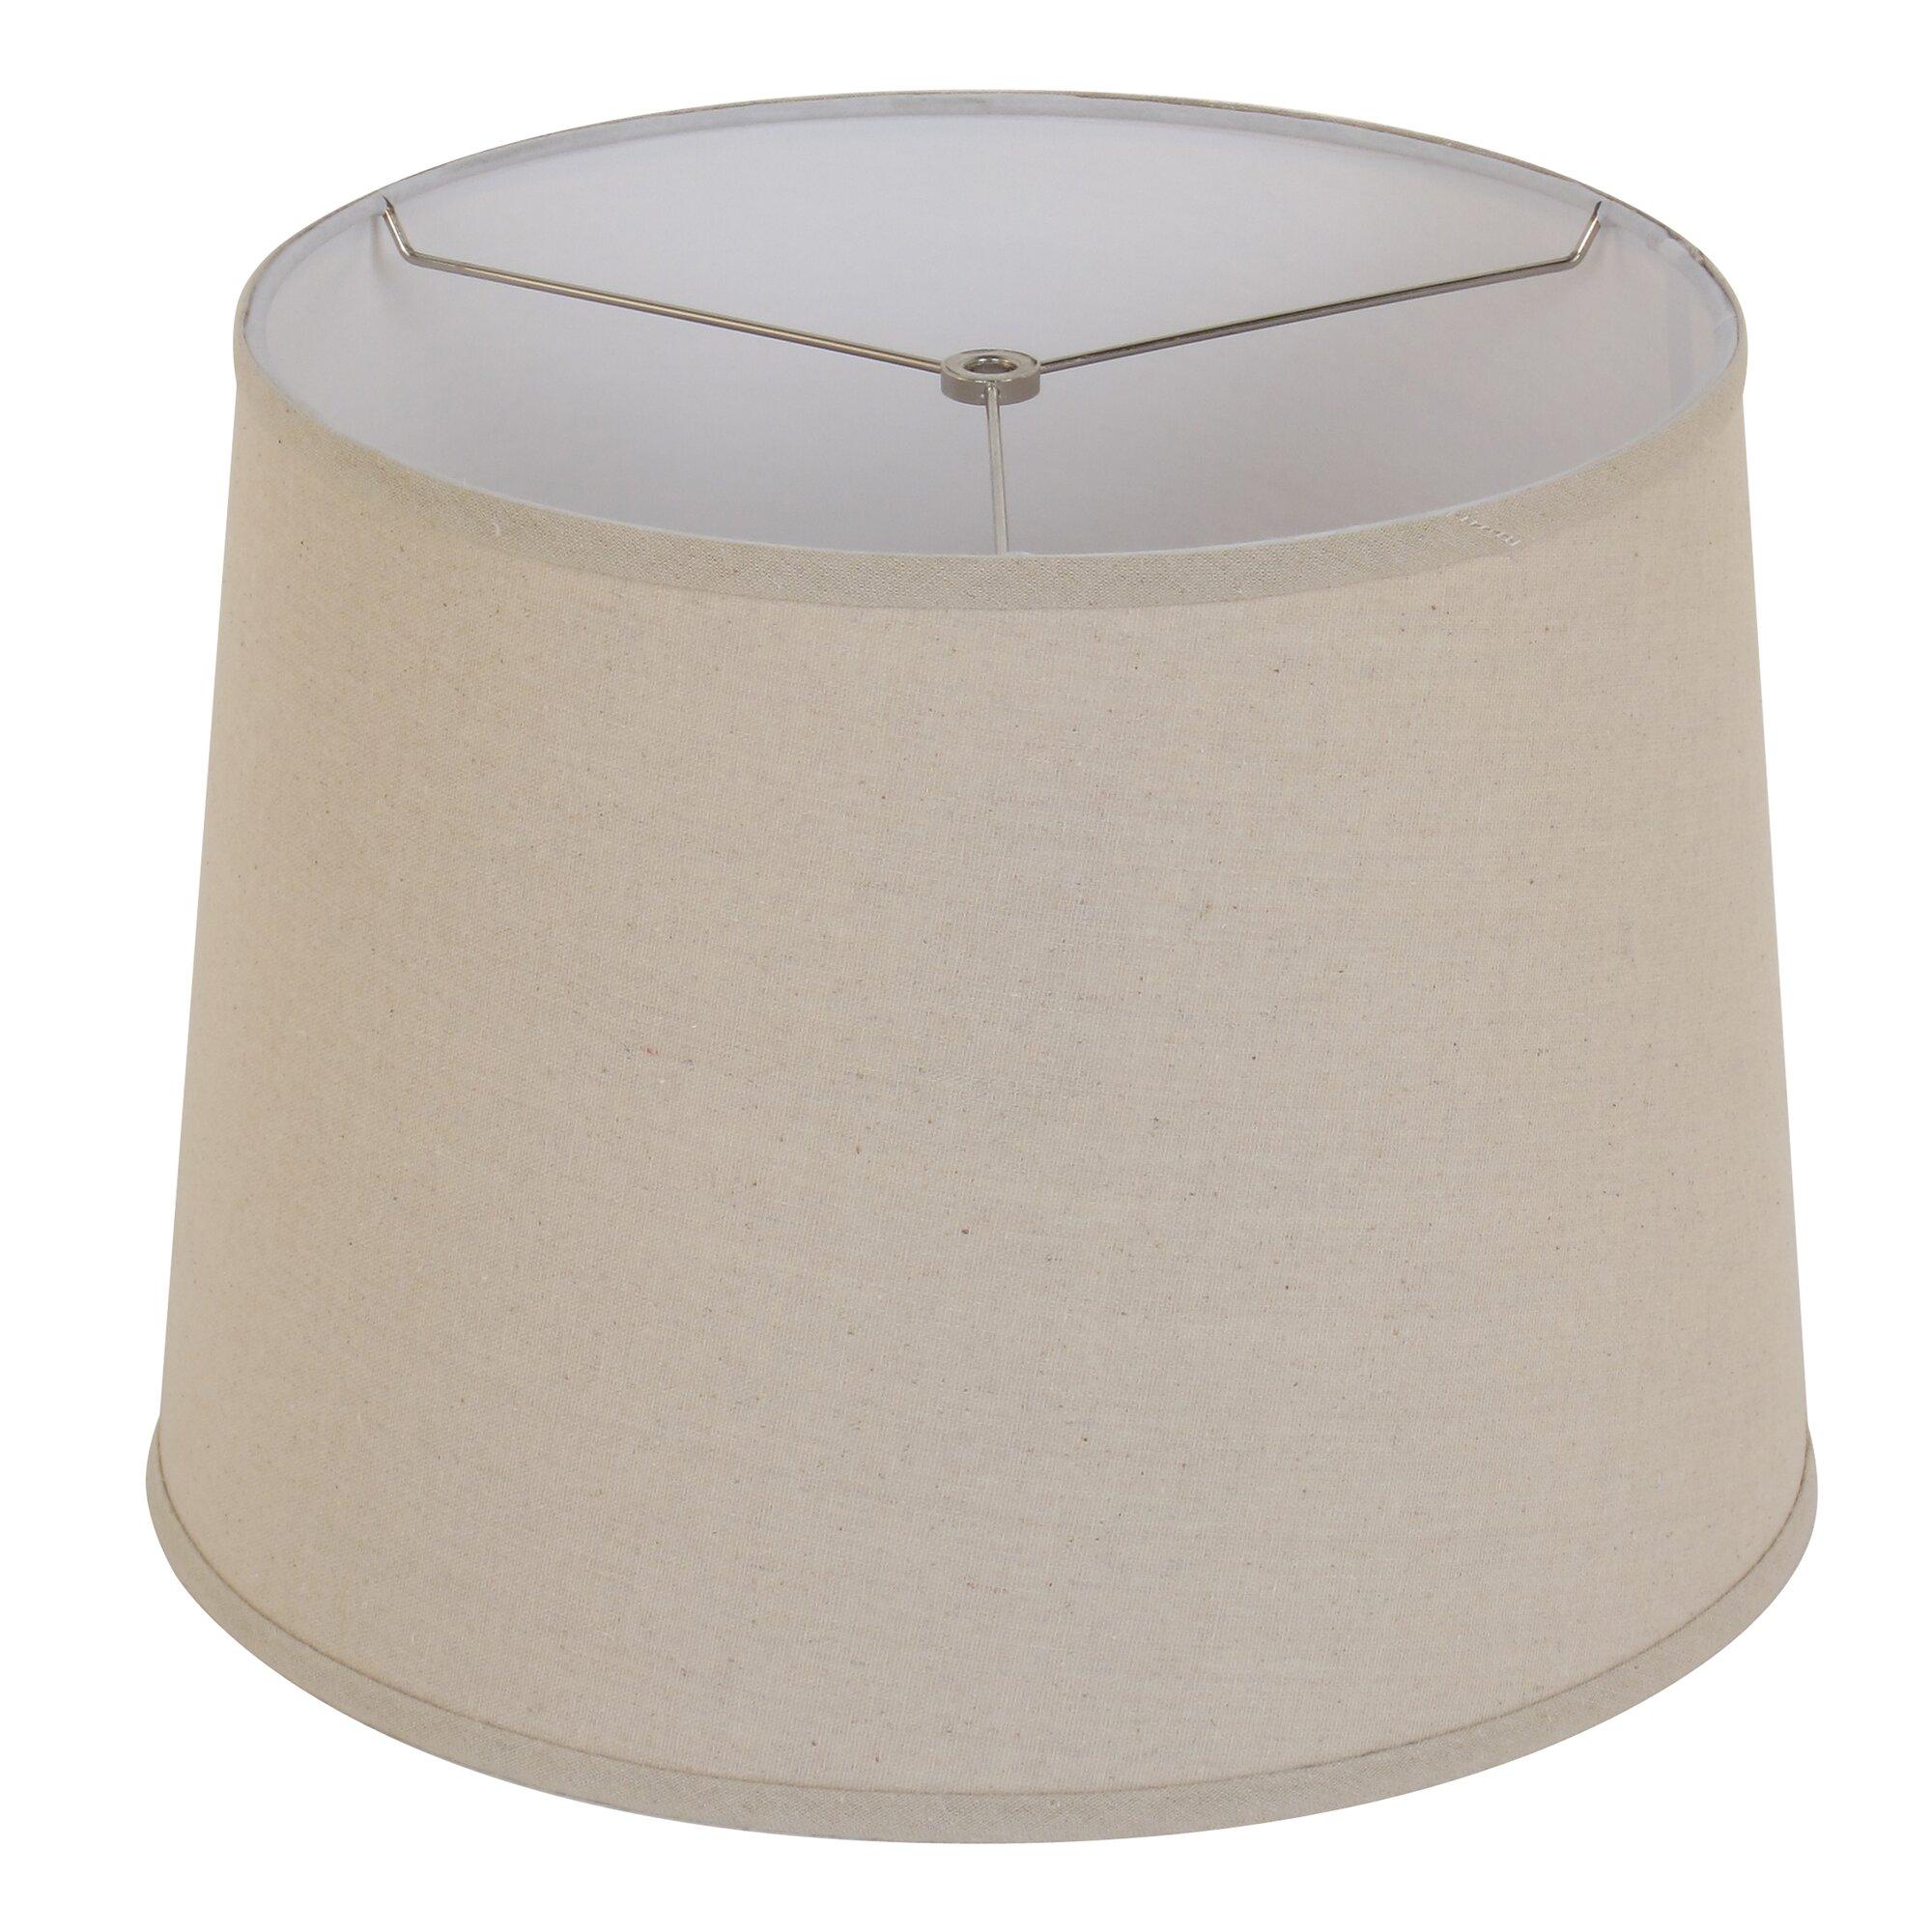 Orange and turquoise lamp shade - 15 Drum Lamp Shade